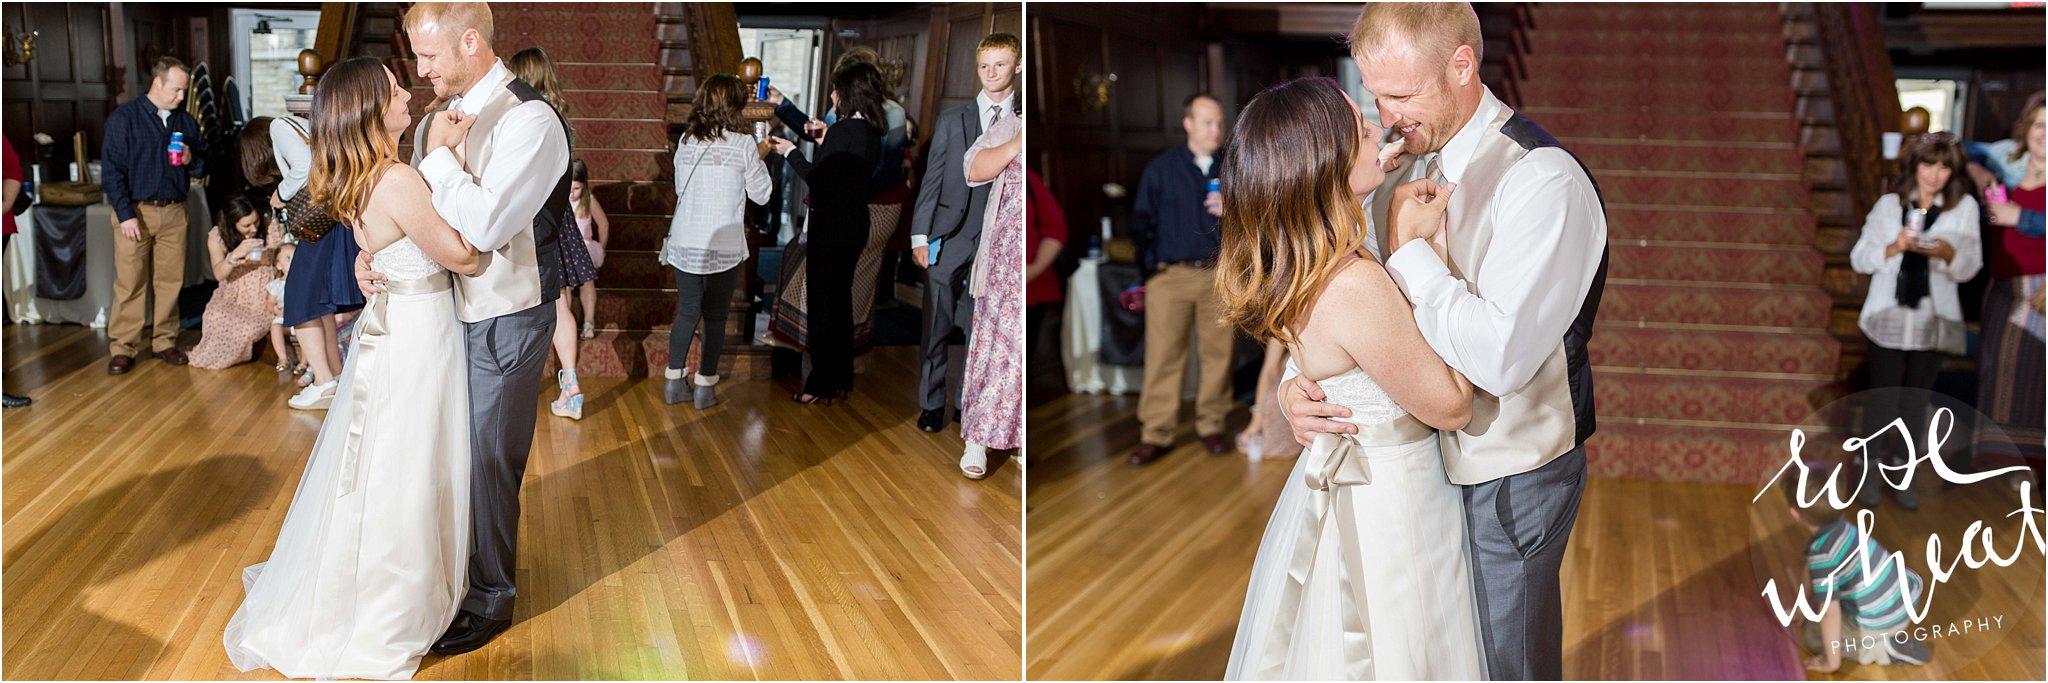 0430018. Dillon House Wedding Topeka KS.JPG